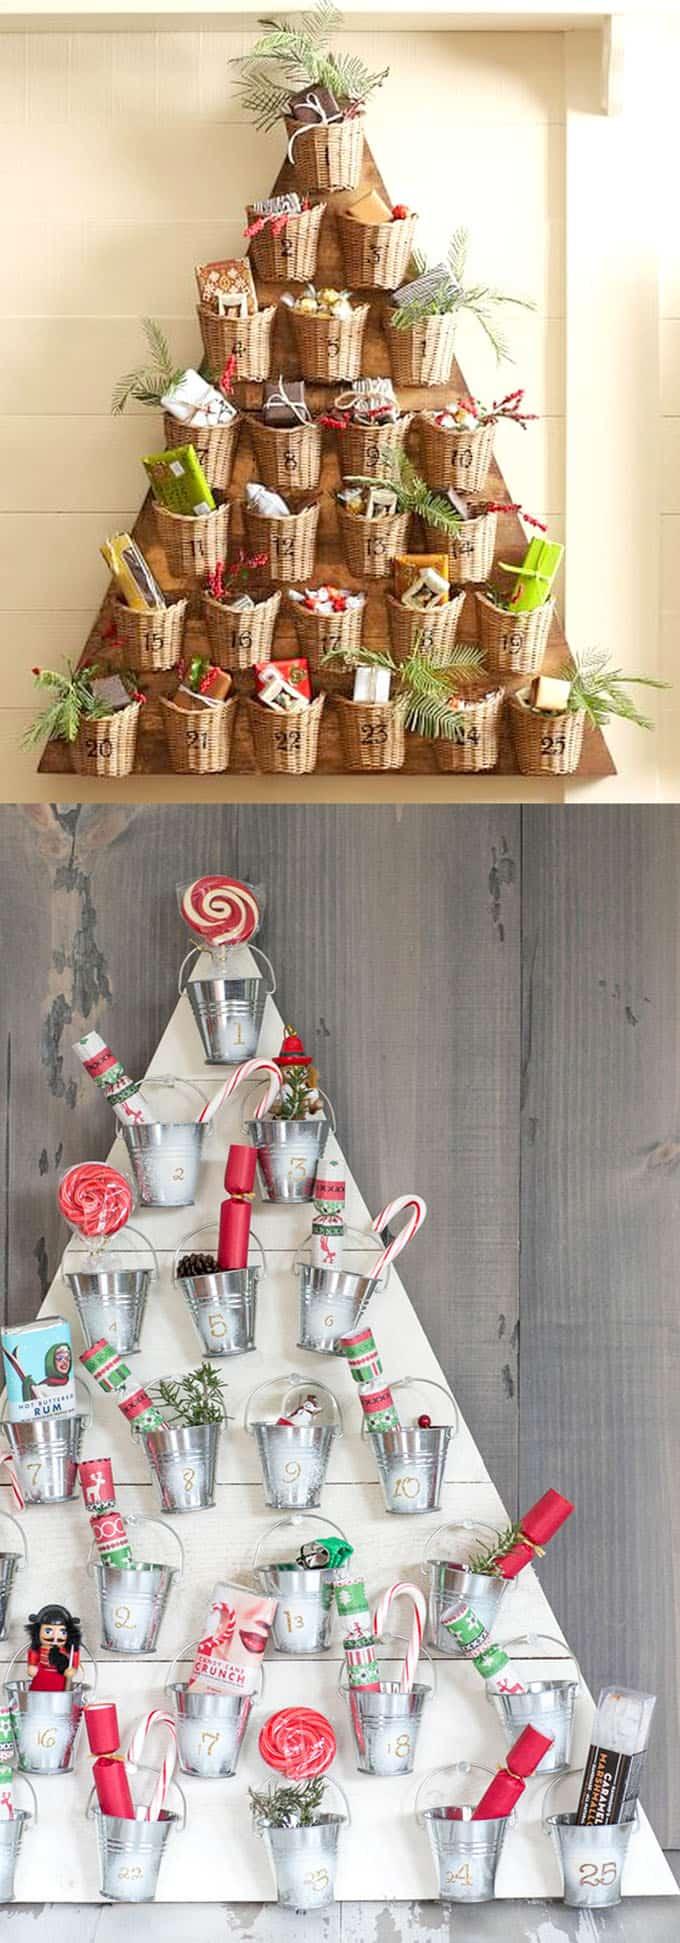 diy christmas tree ideas apieceofrainbow 11 - 48 Amazing Alternative Christmas Tree Ideas